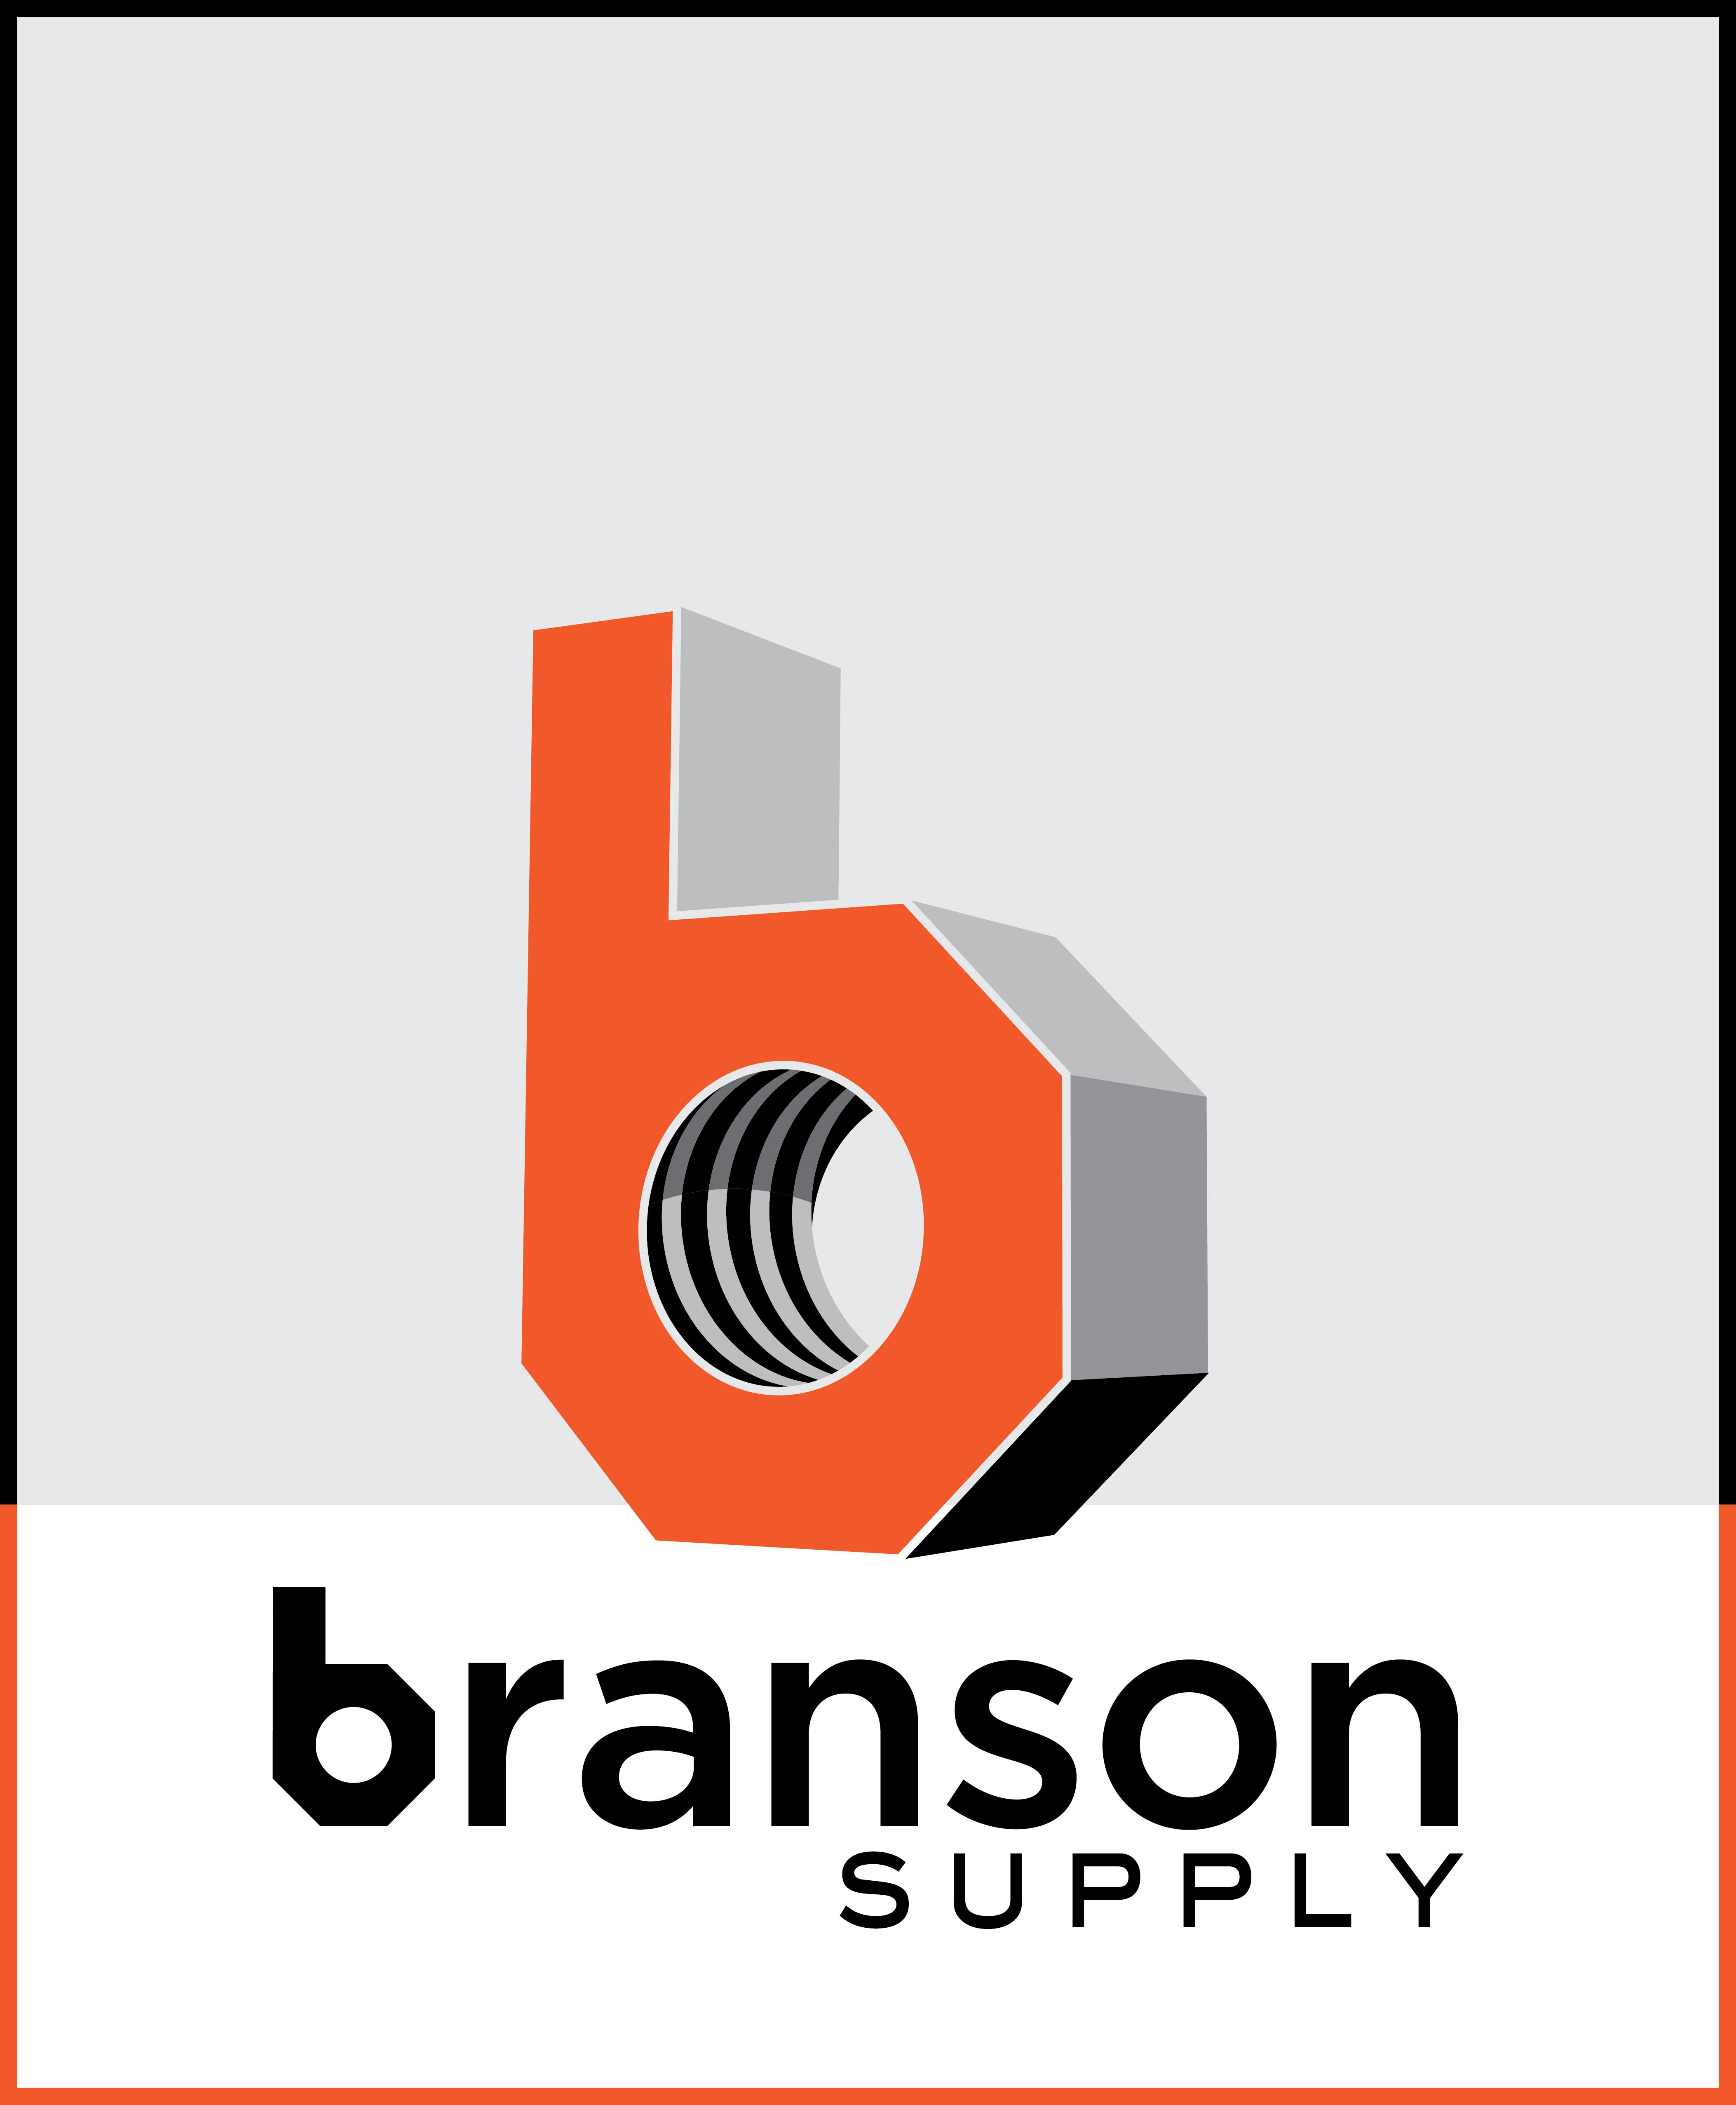 http://www.bransonsupply.com